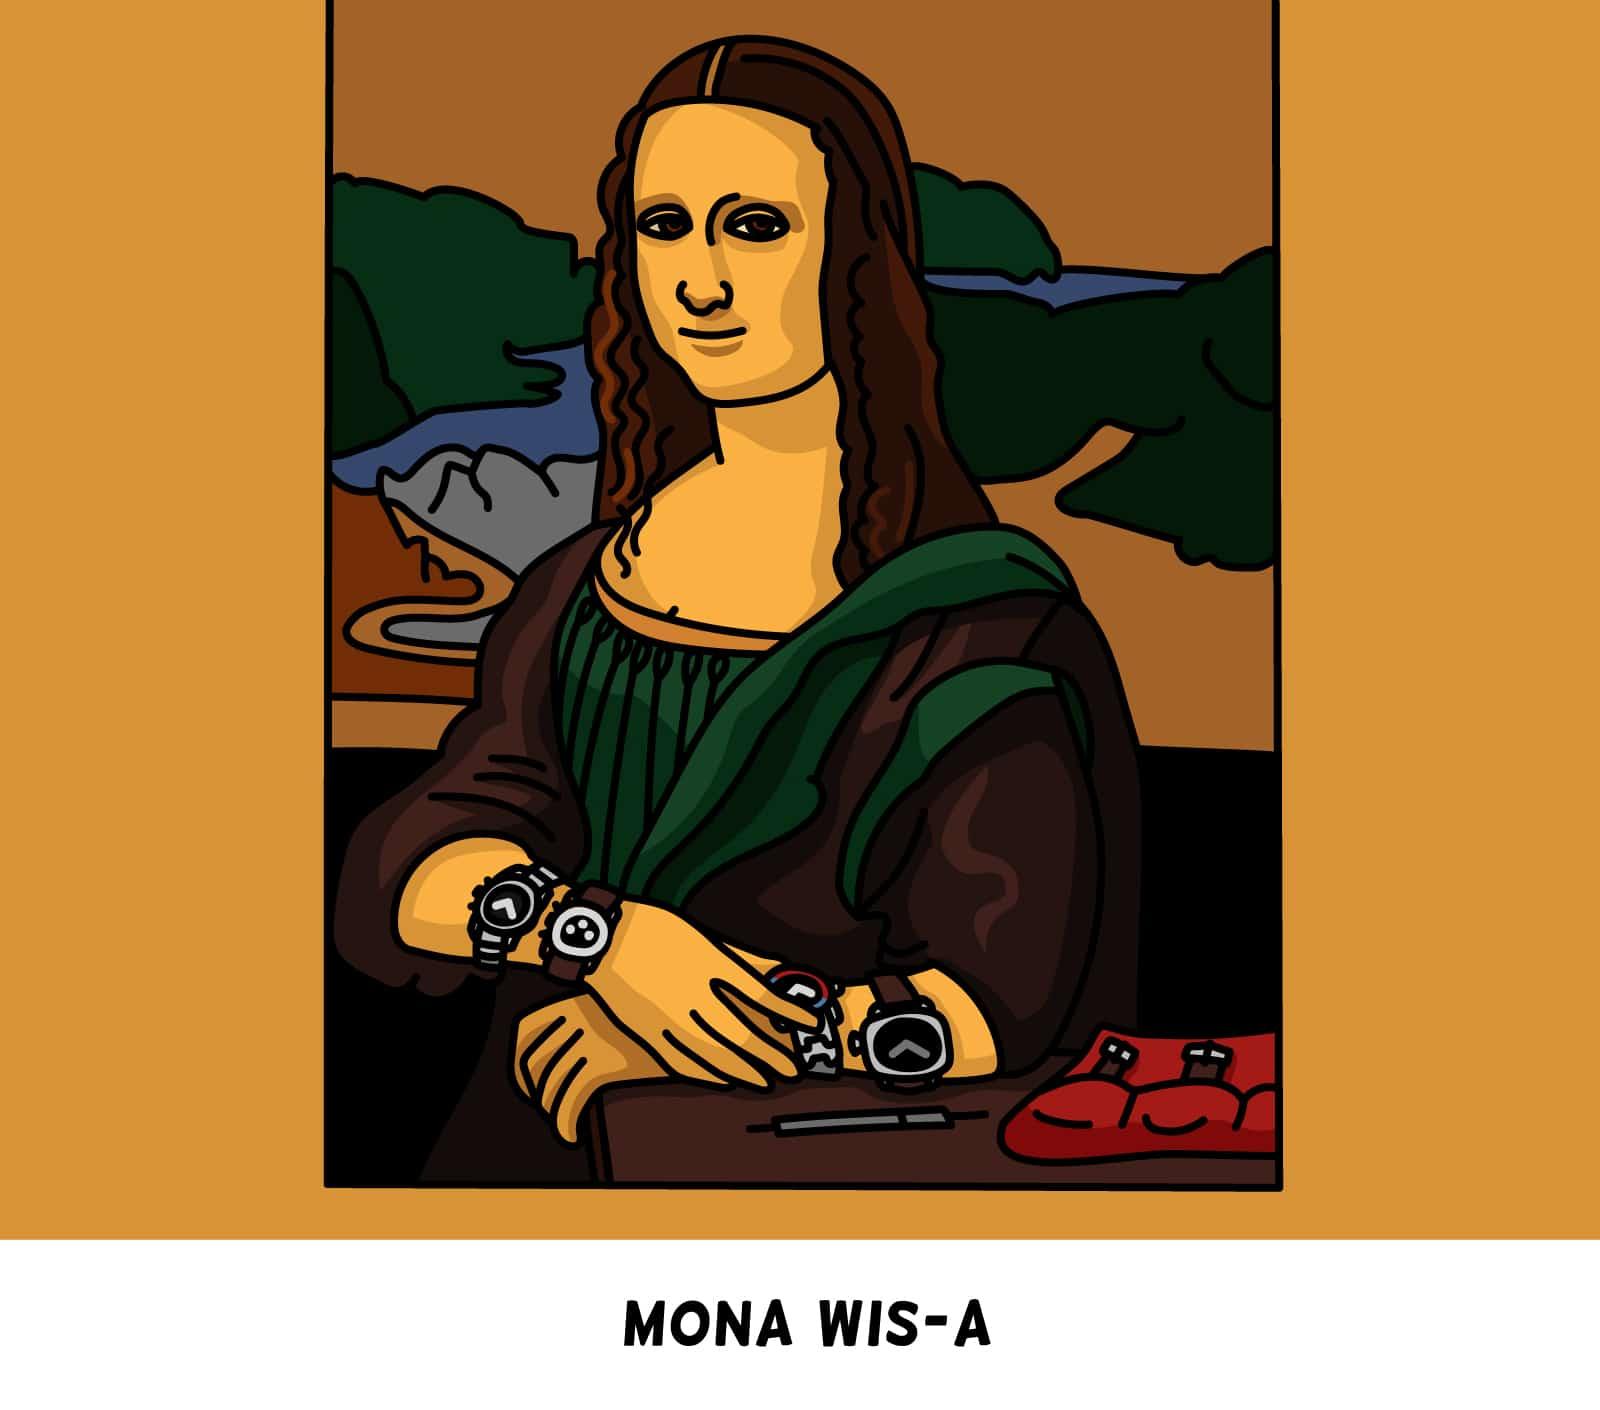 Mona WIS-a Watch Art